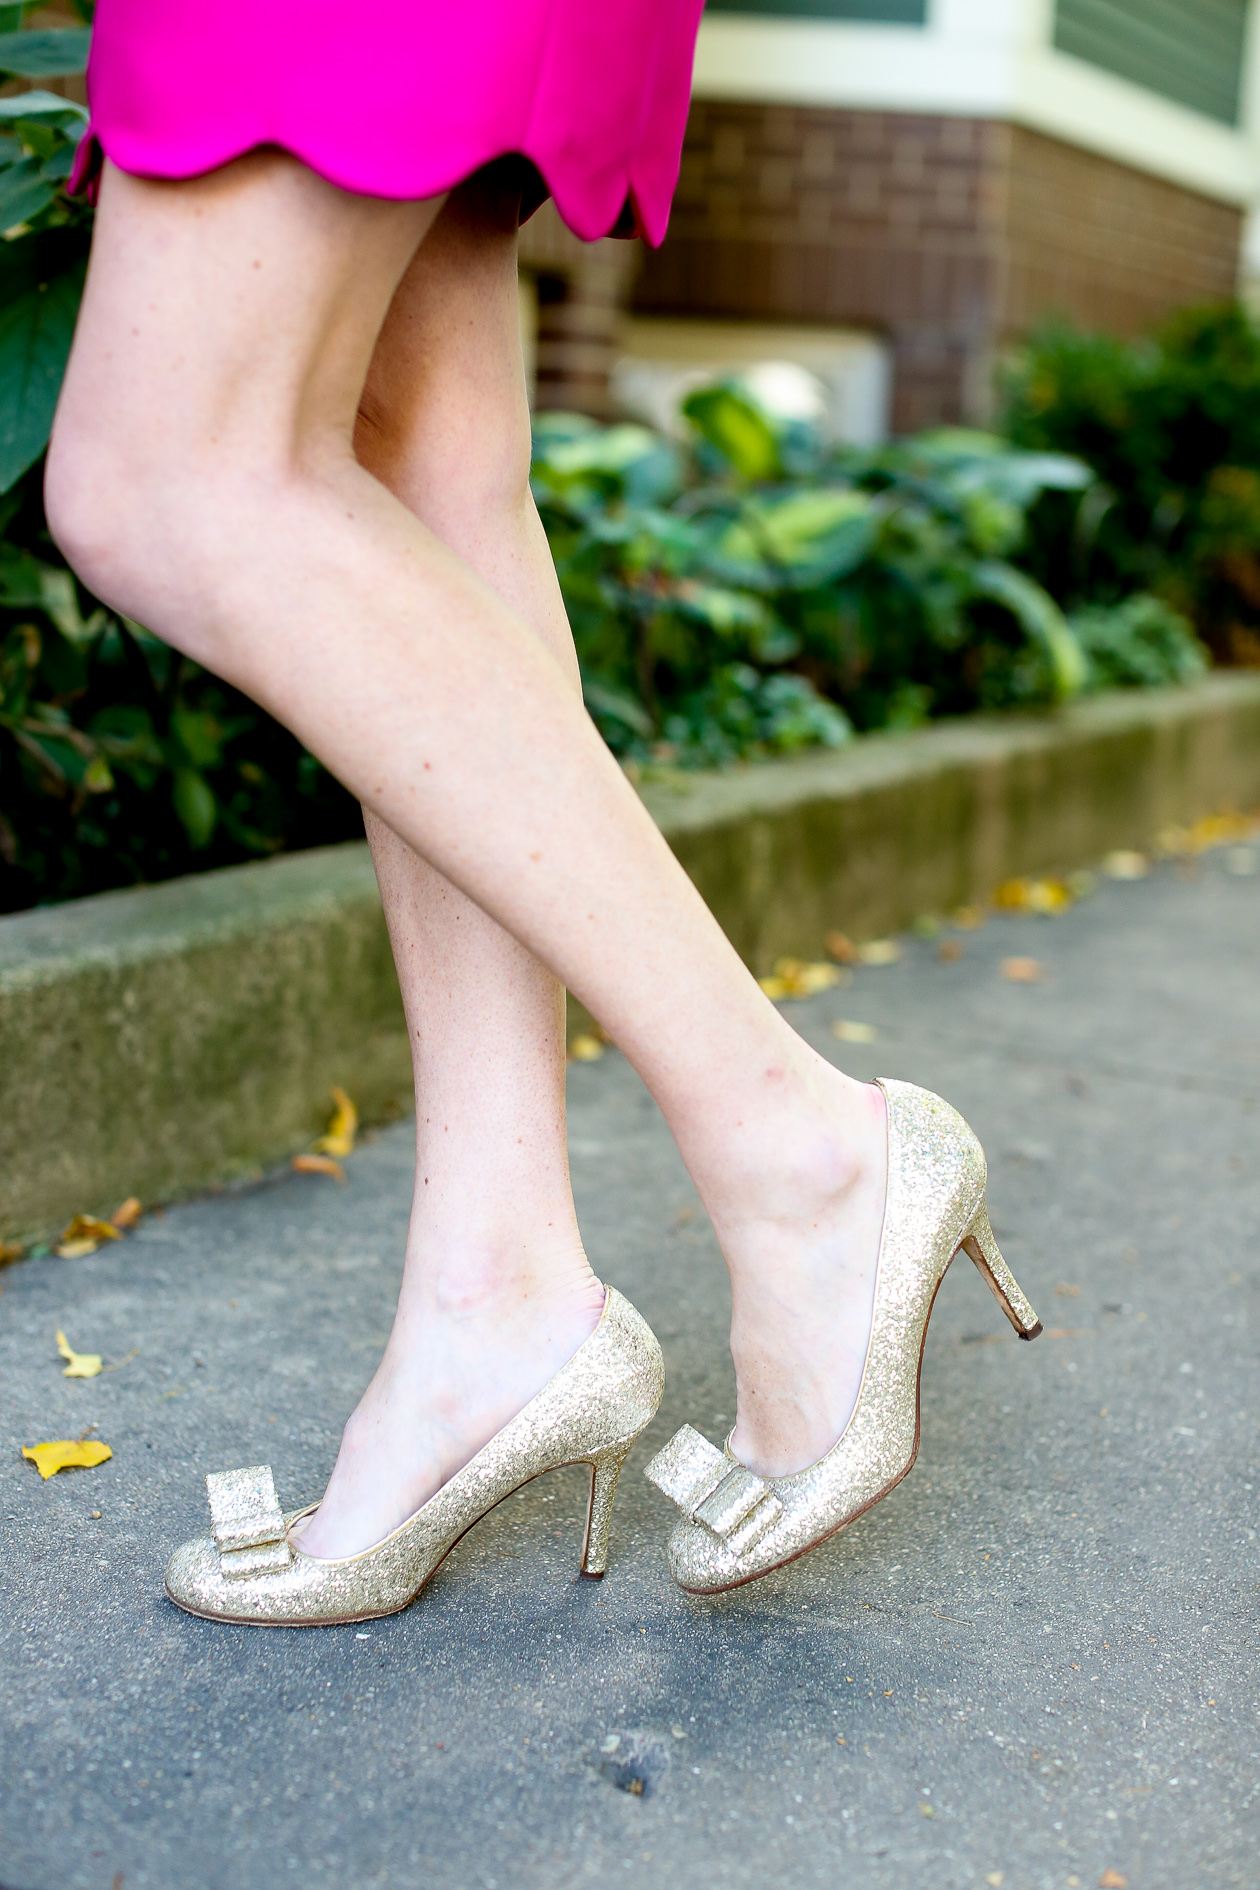 Camilyn Beth Scalloped Bridgette Dress-300